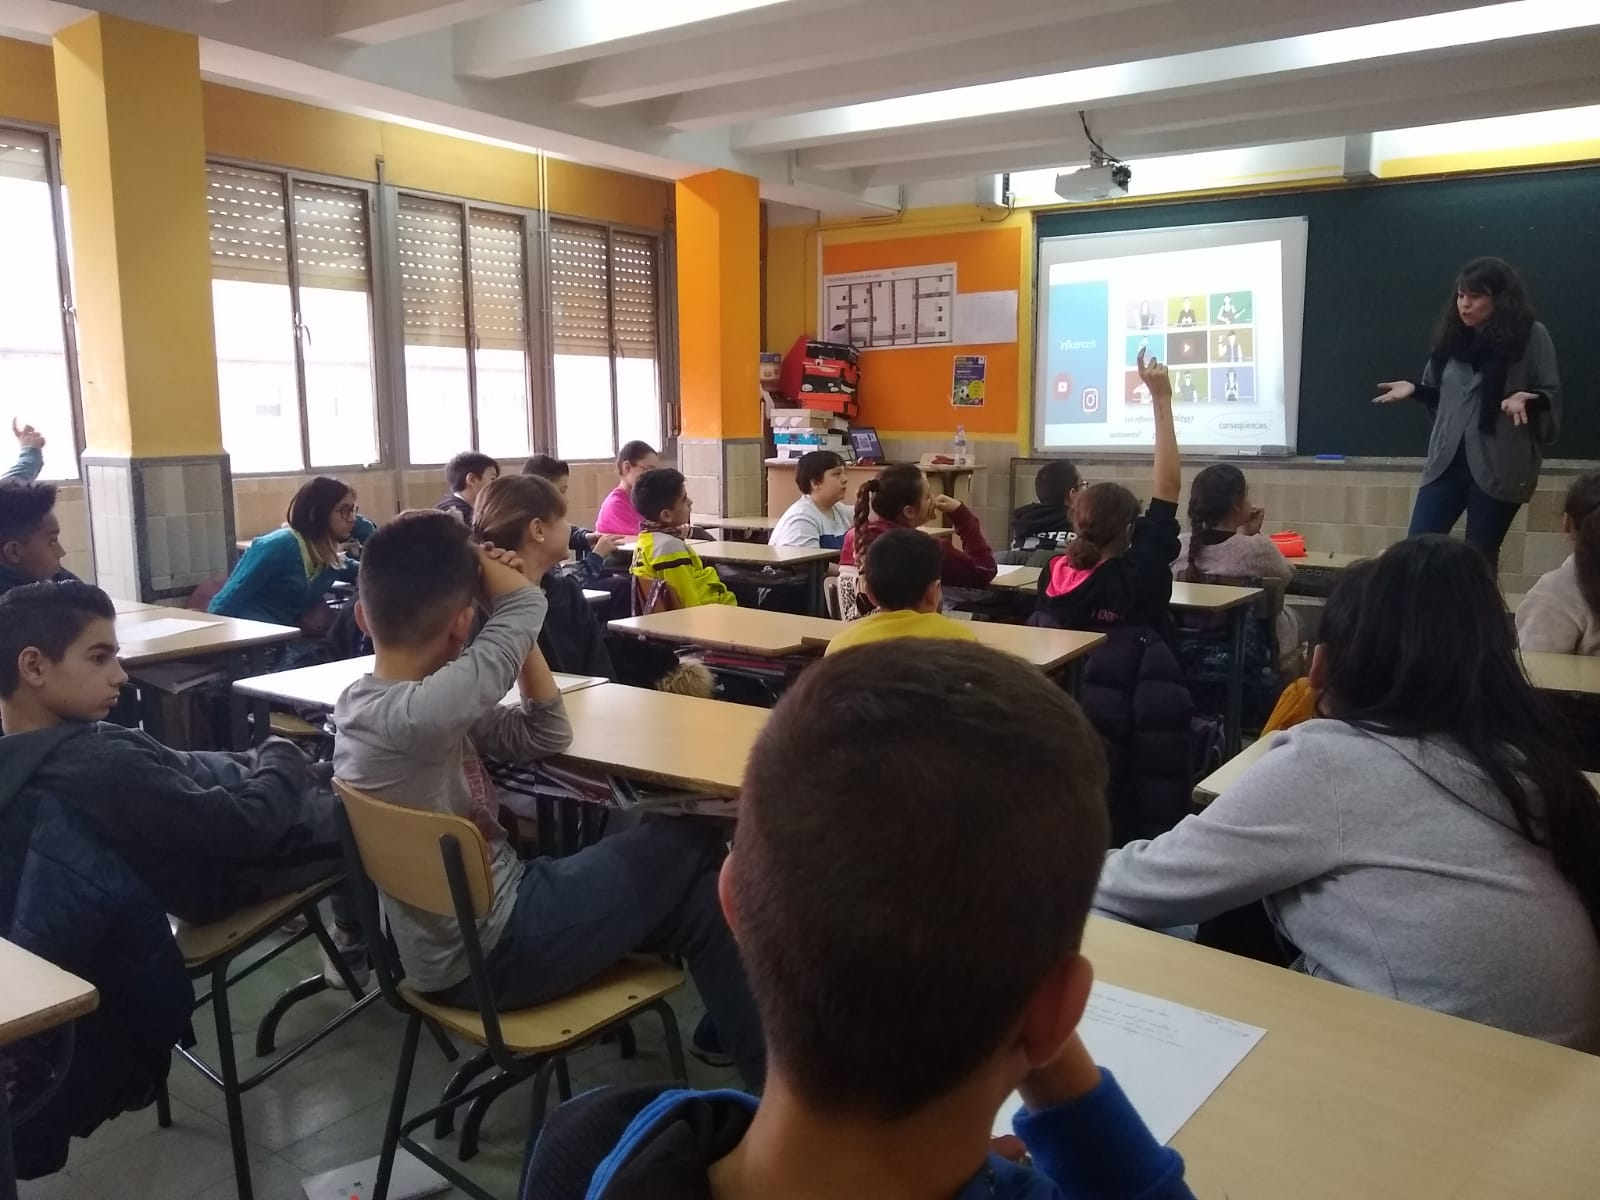 Talleres-Smarthuman-PantallasAmigas-Escola-L_Esperança-alumnos